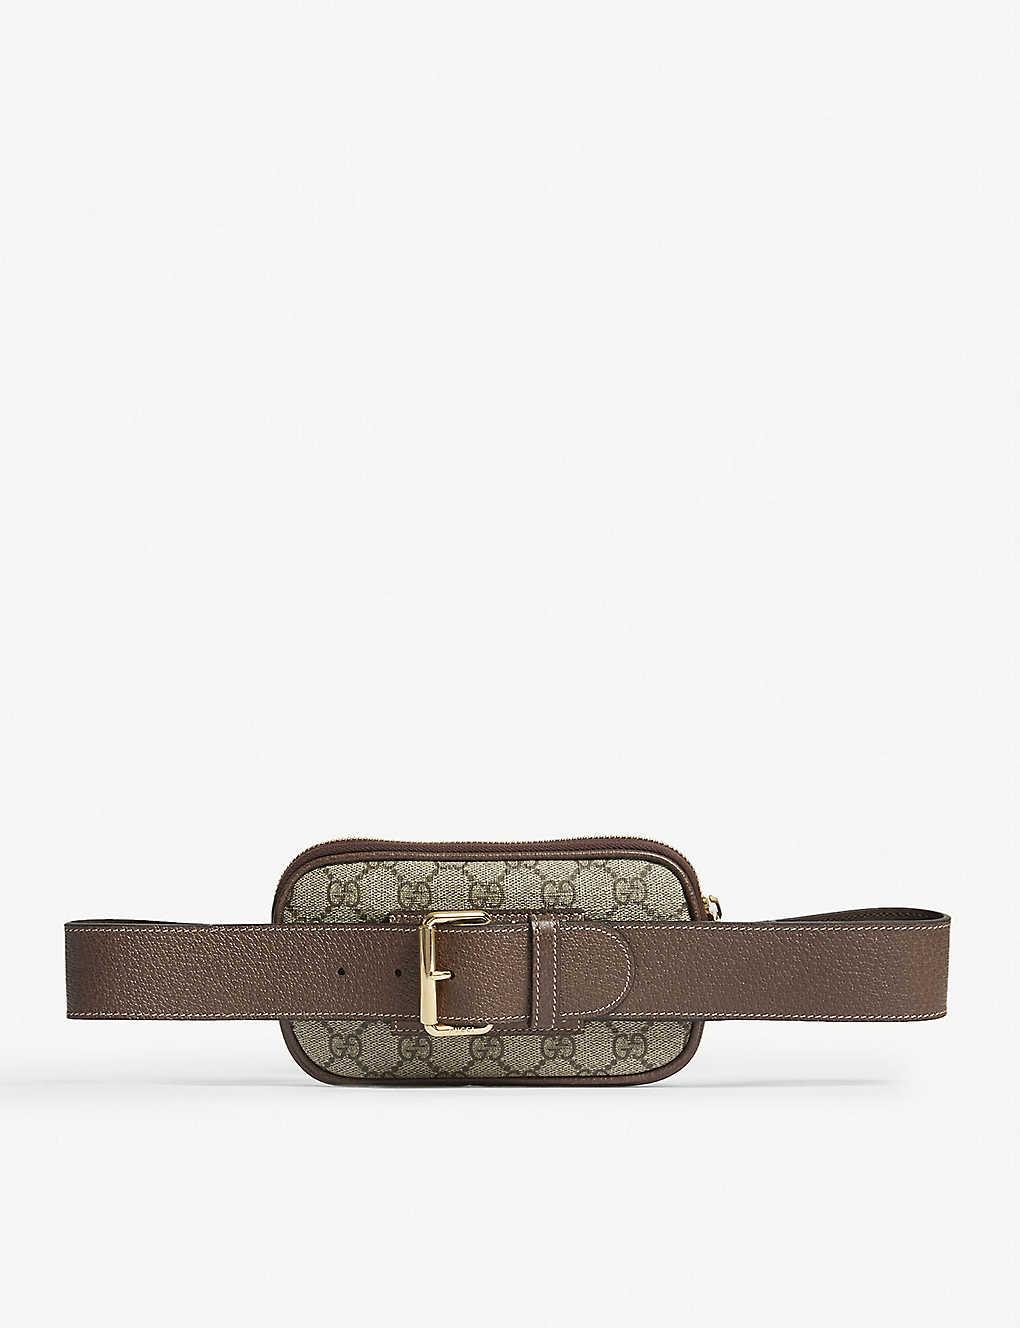 21592cc8654 GUCCI - Ophidia mini GG Supreme belt bag